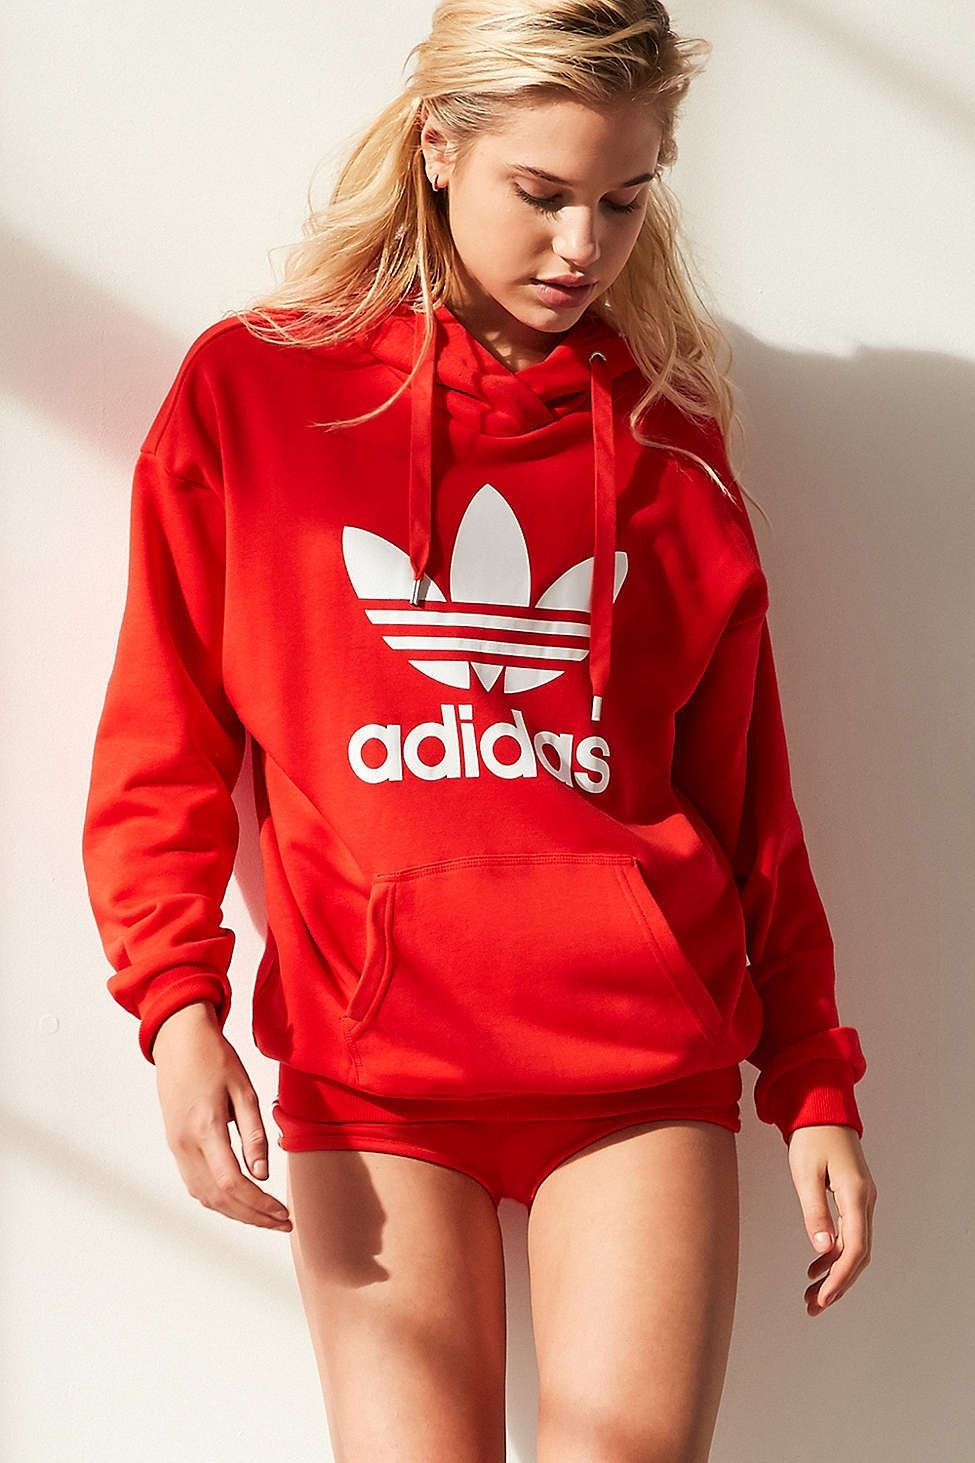 adidas Originals Trefoil Hoodie Sweatshirt - Urban Outfitters  8cfc306790f